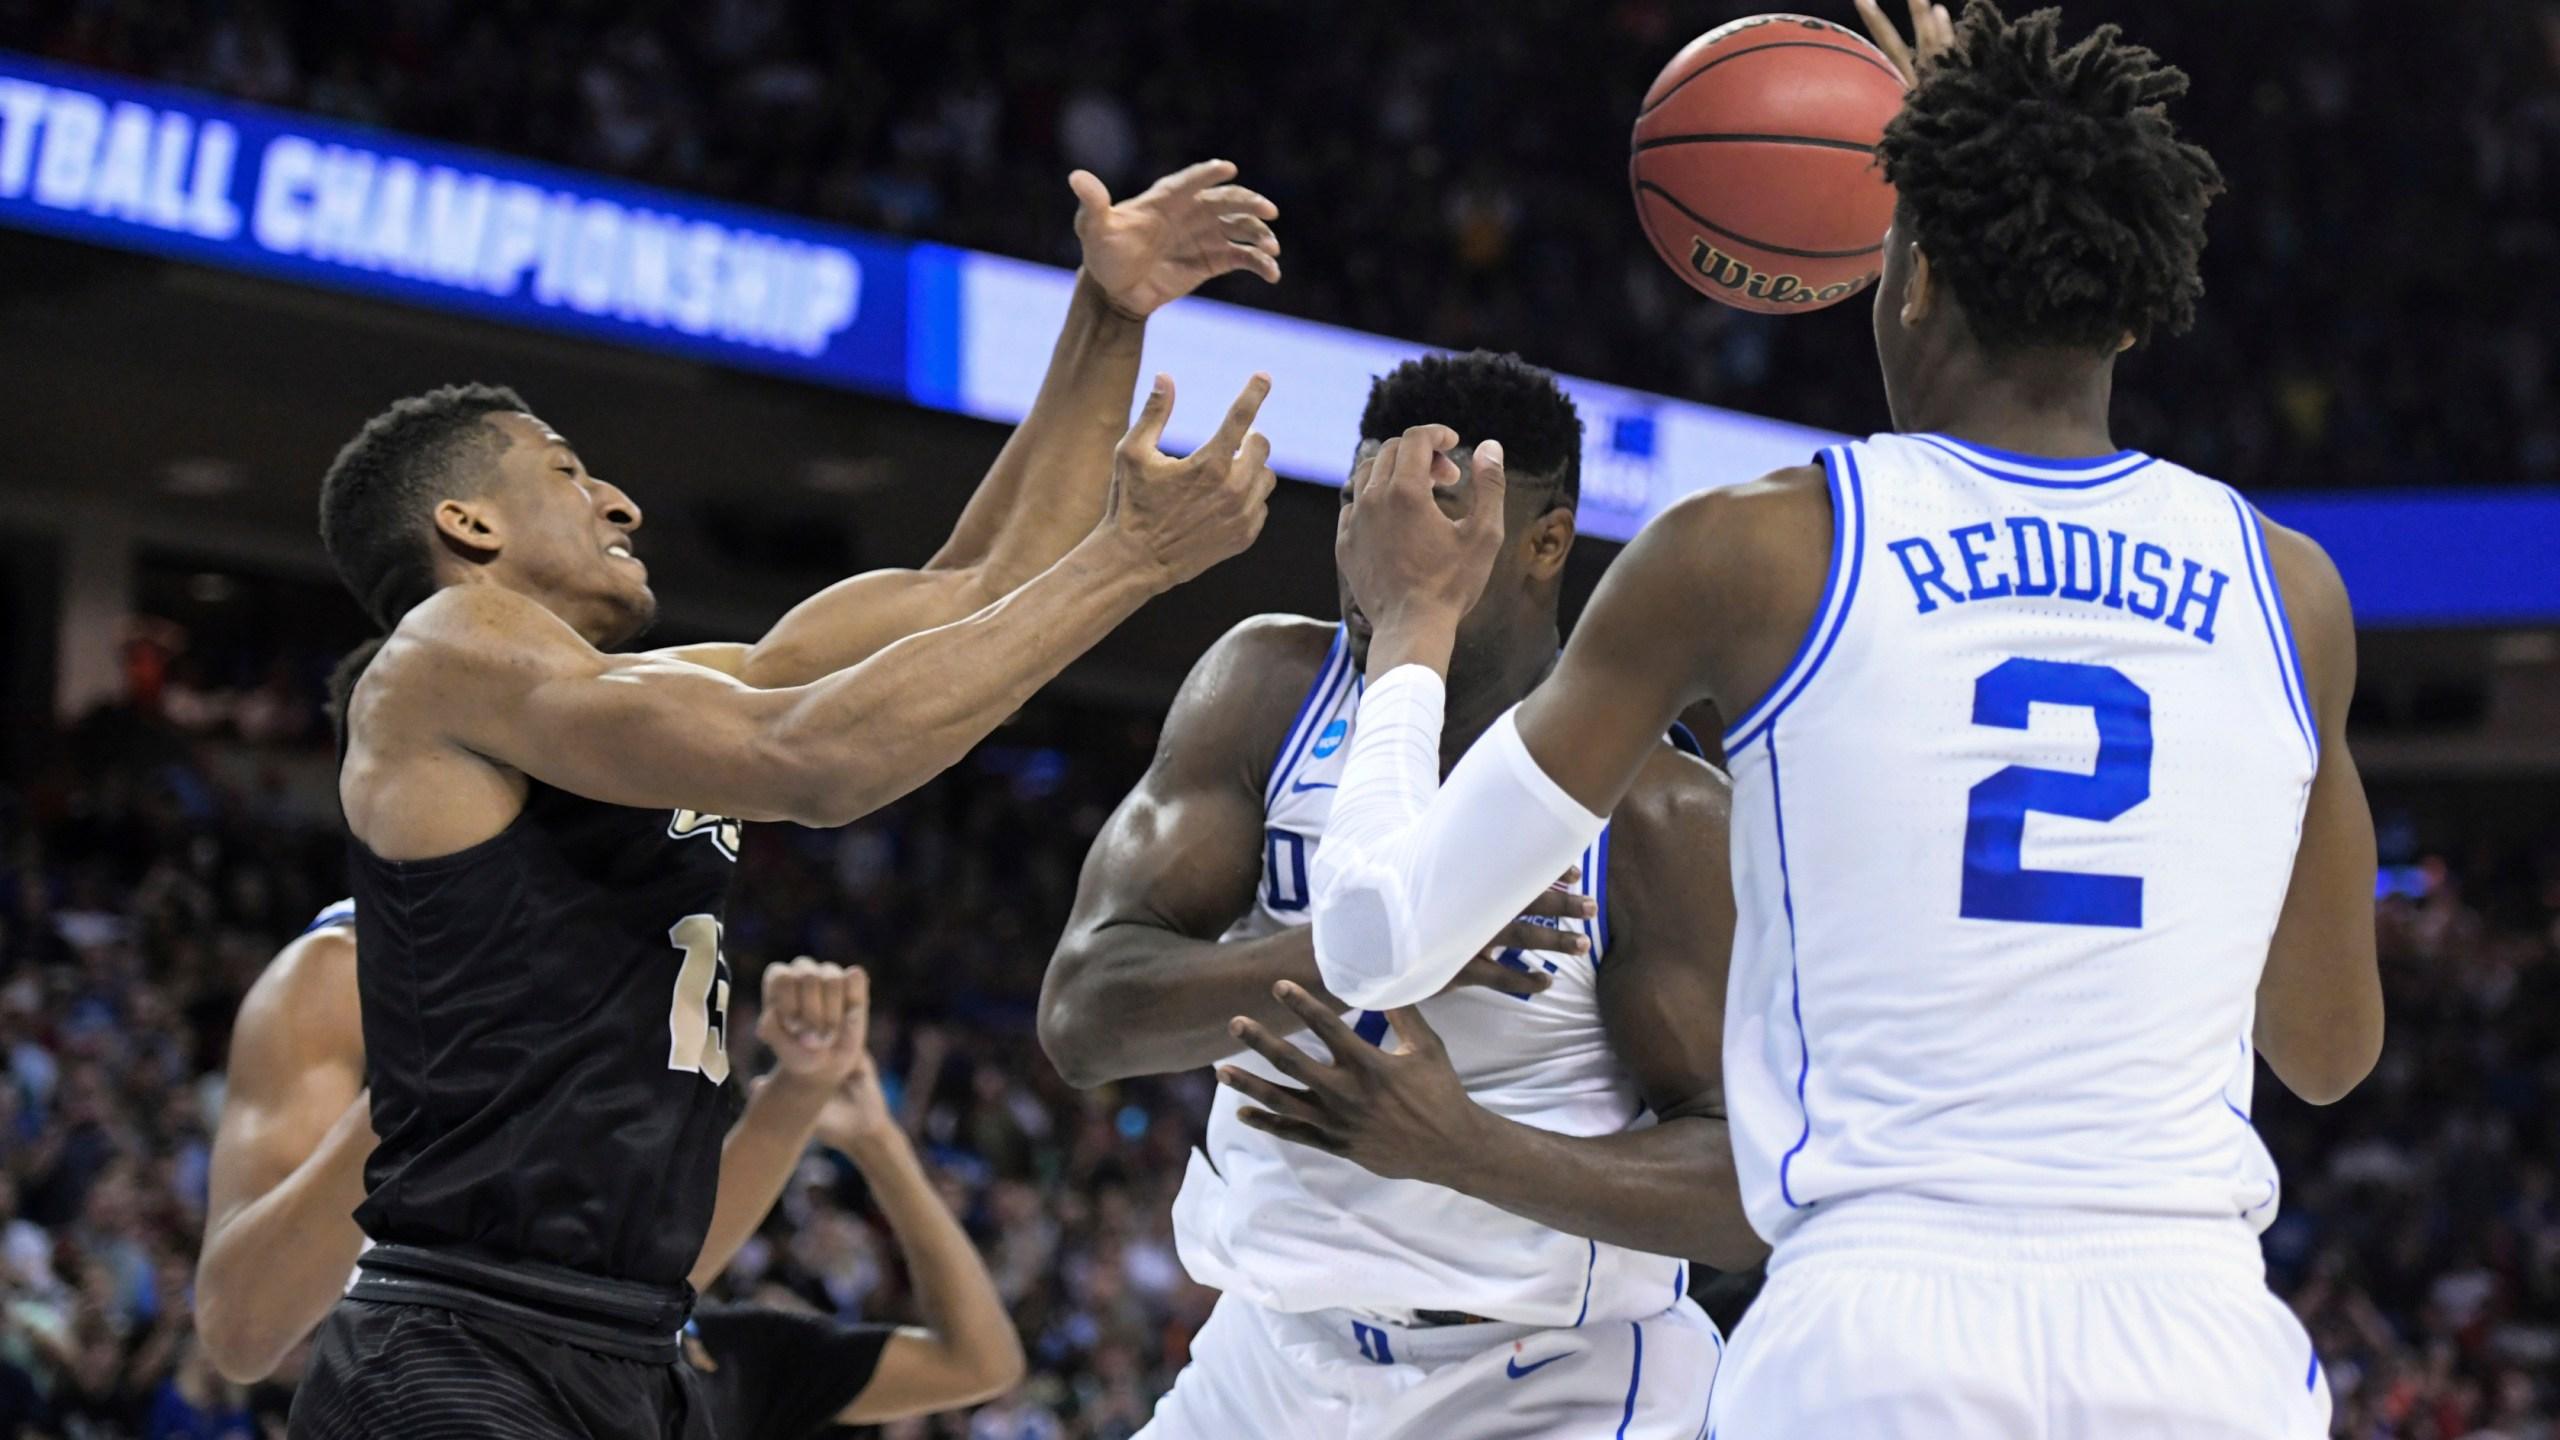 NCAA_UCF_Duke_Basketball_79749-159532.jpg83267707